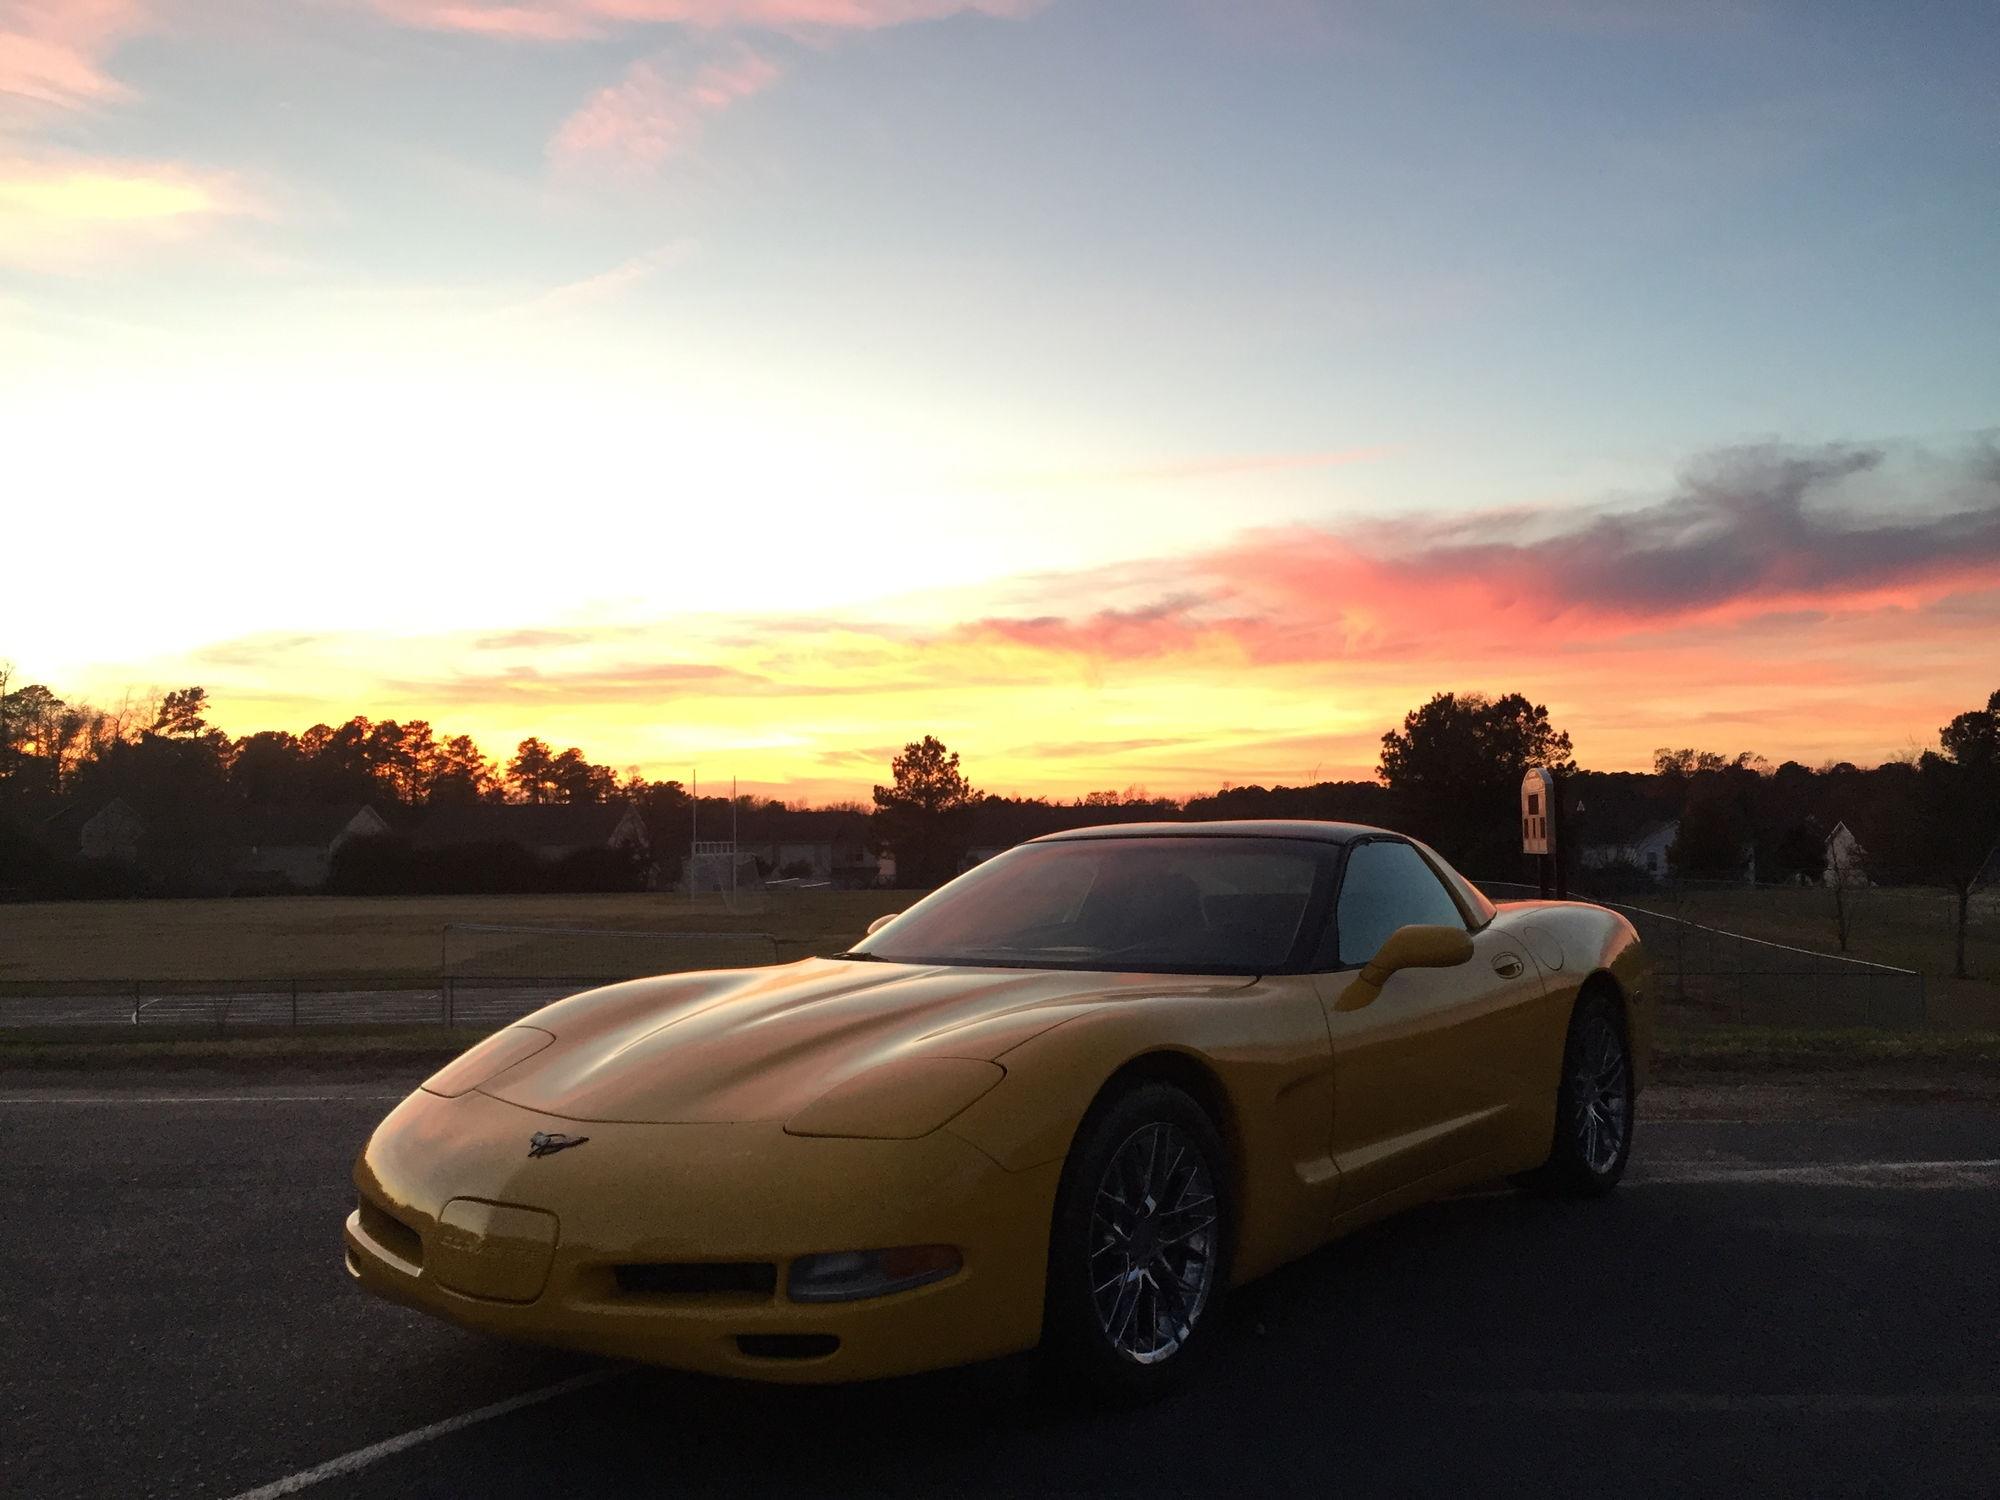 c5 fs 2001 millenium yellow c5 corvette built corvette international. Black Bedroom Furniture Sets. Home Design Ideas